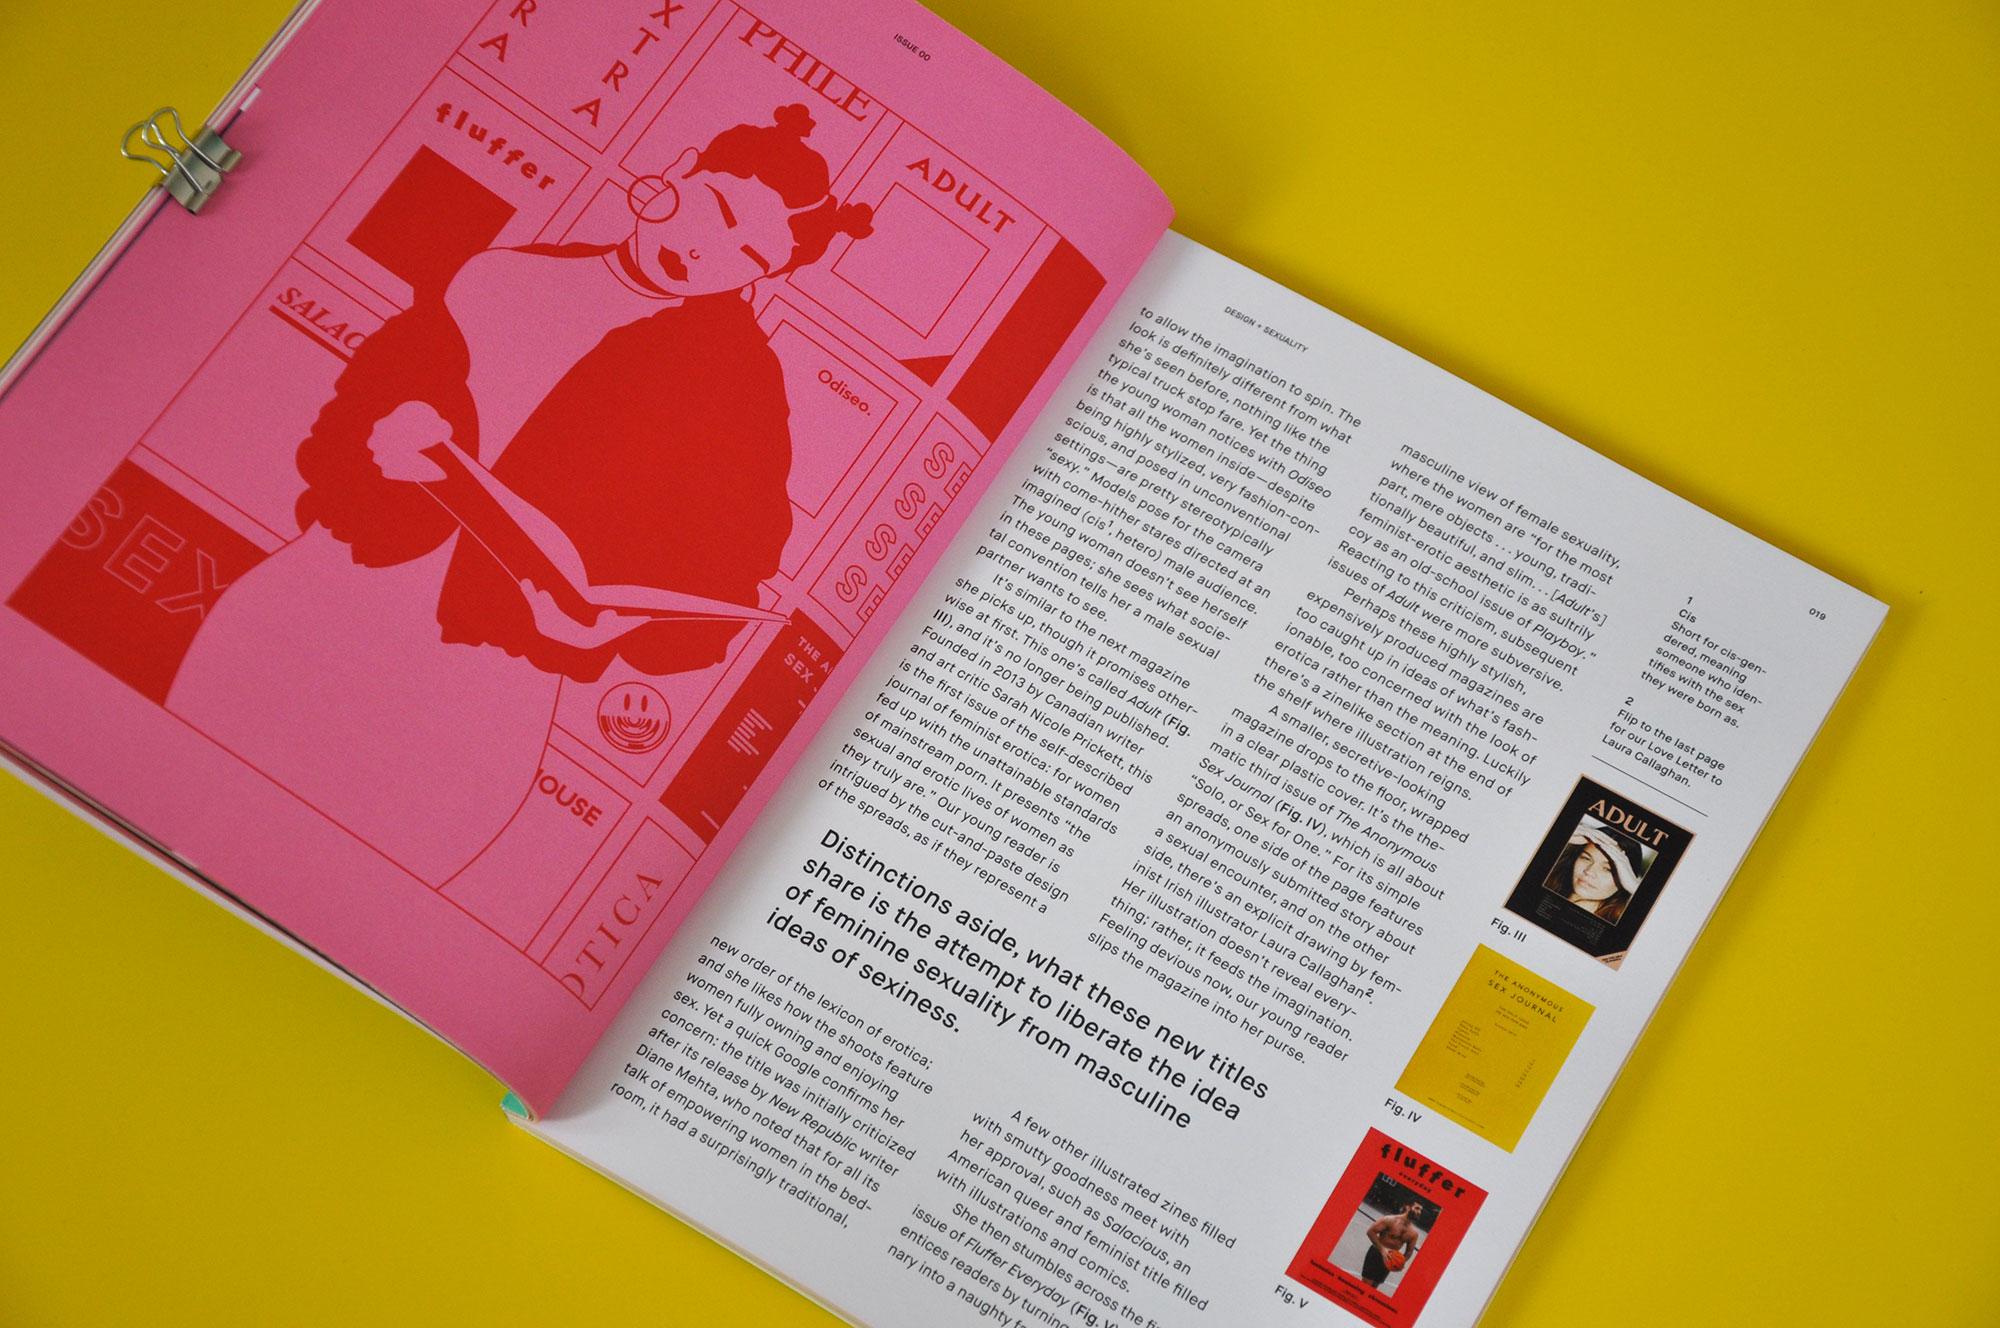 aiga eye on design magazine 5